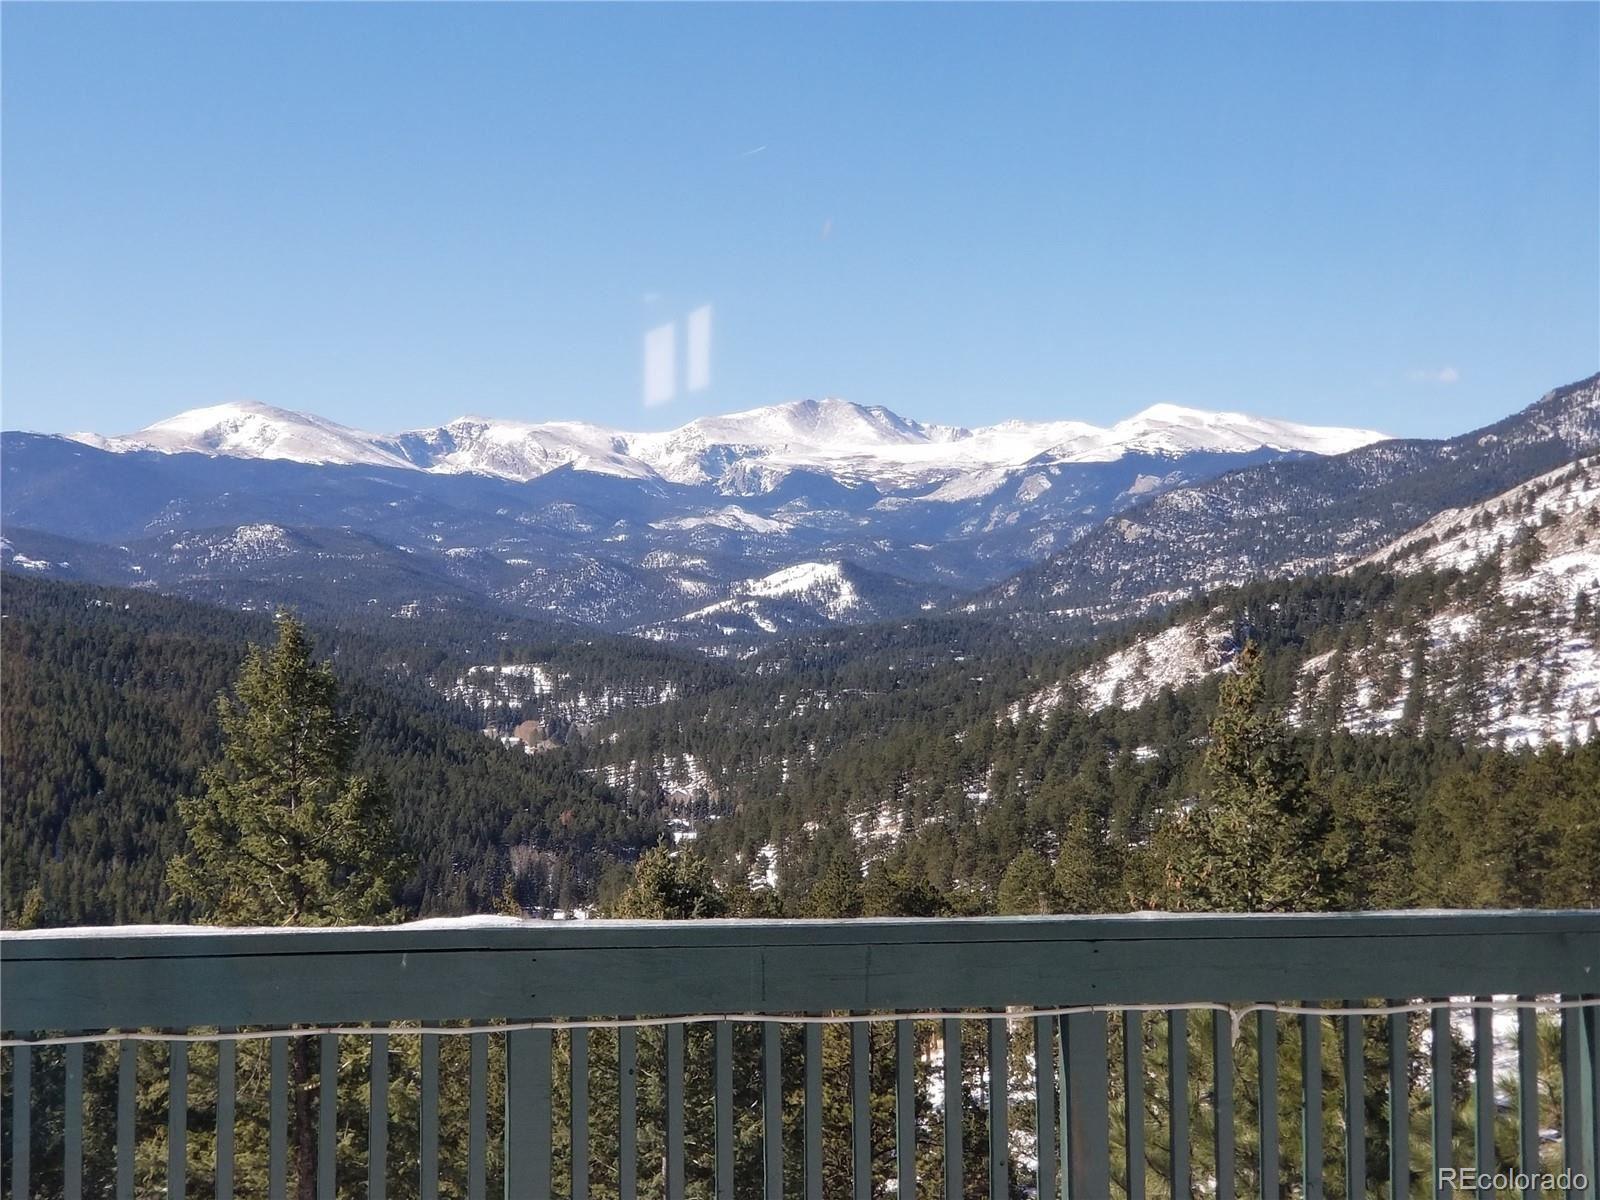 3883 Mountainside Trail, Evergreen, CO 80439 - #: 6517018